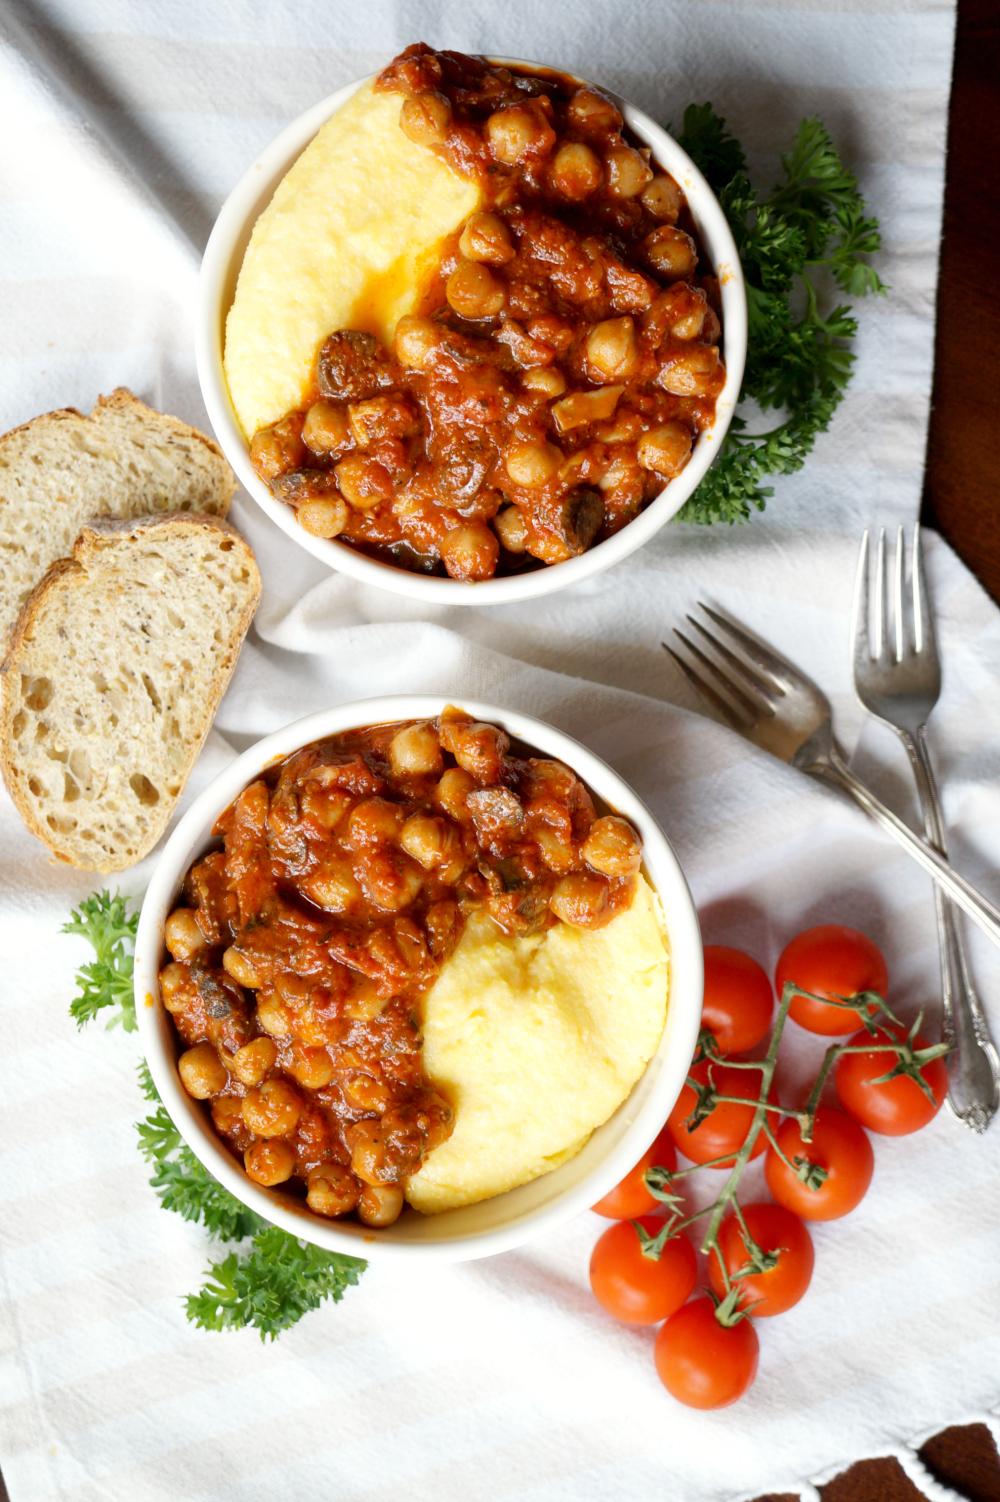 vegan chickpea mushroom tomato stew with polenta | The Baking Fairy